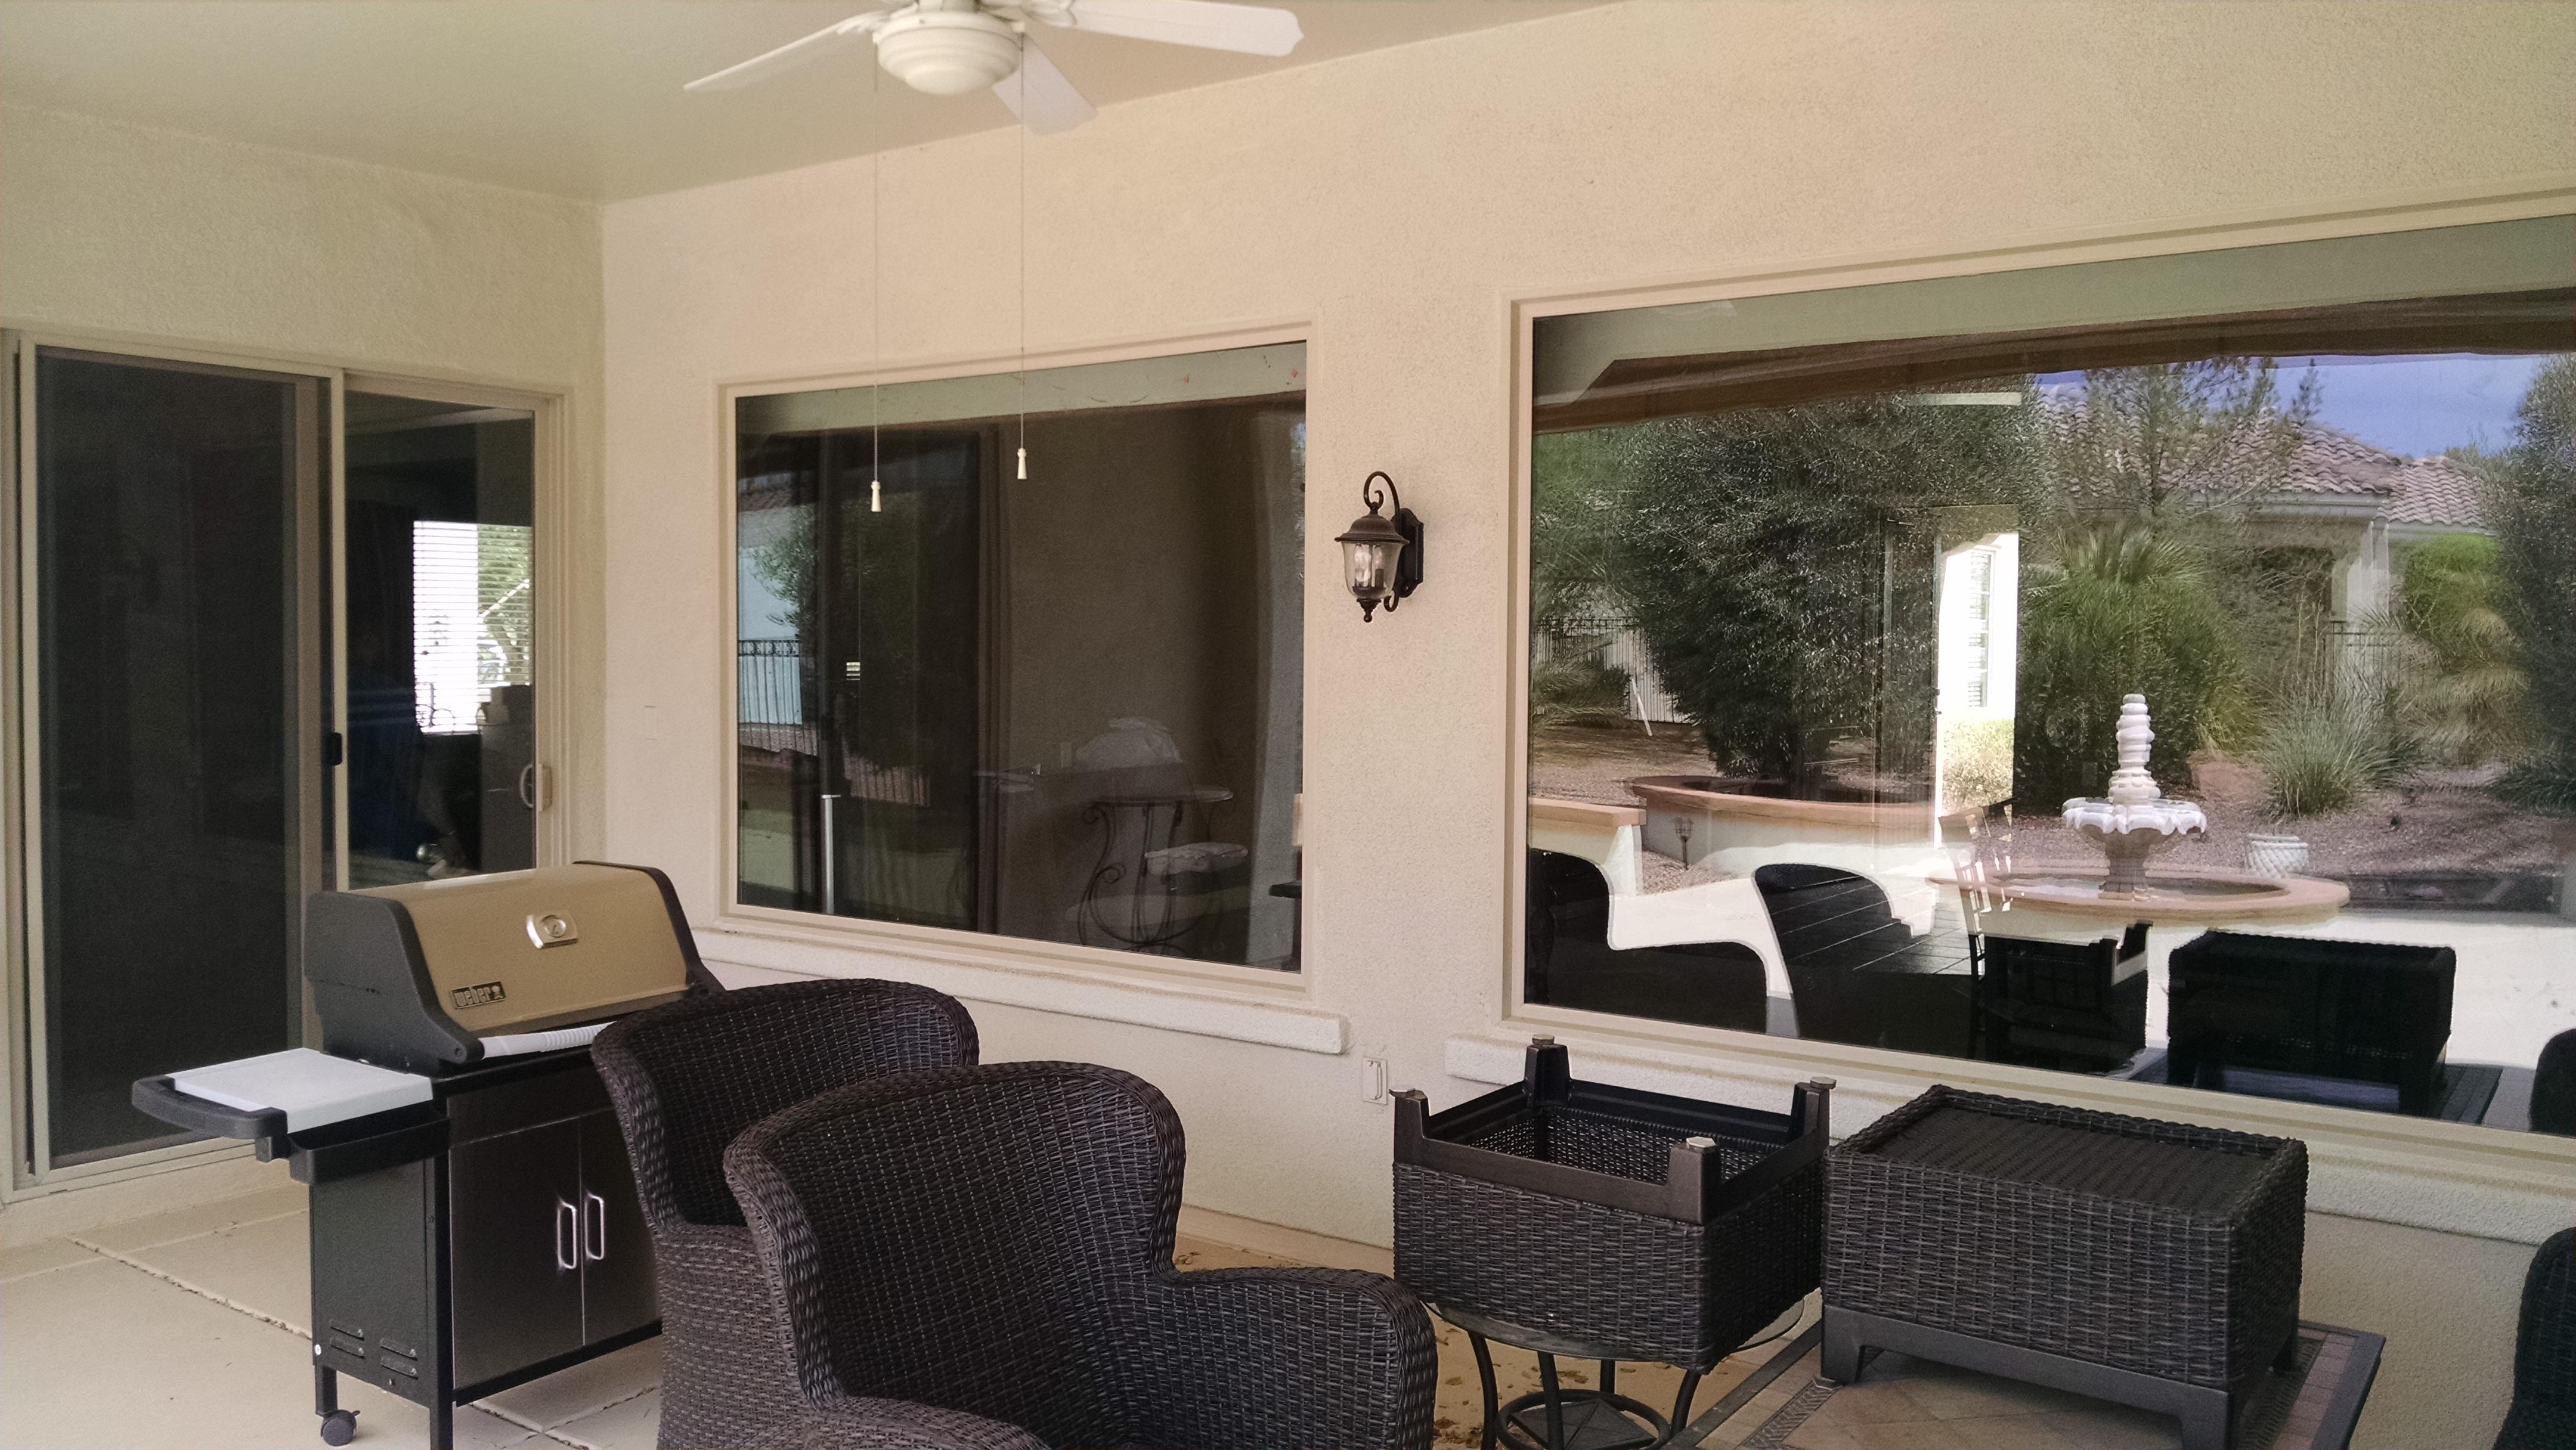 Completed Window Replacement In Phoenix AZ